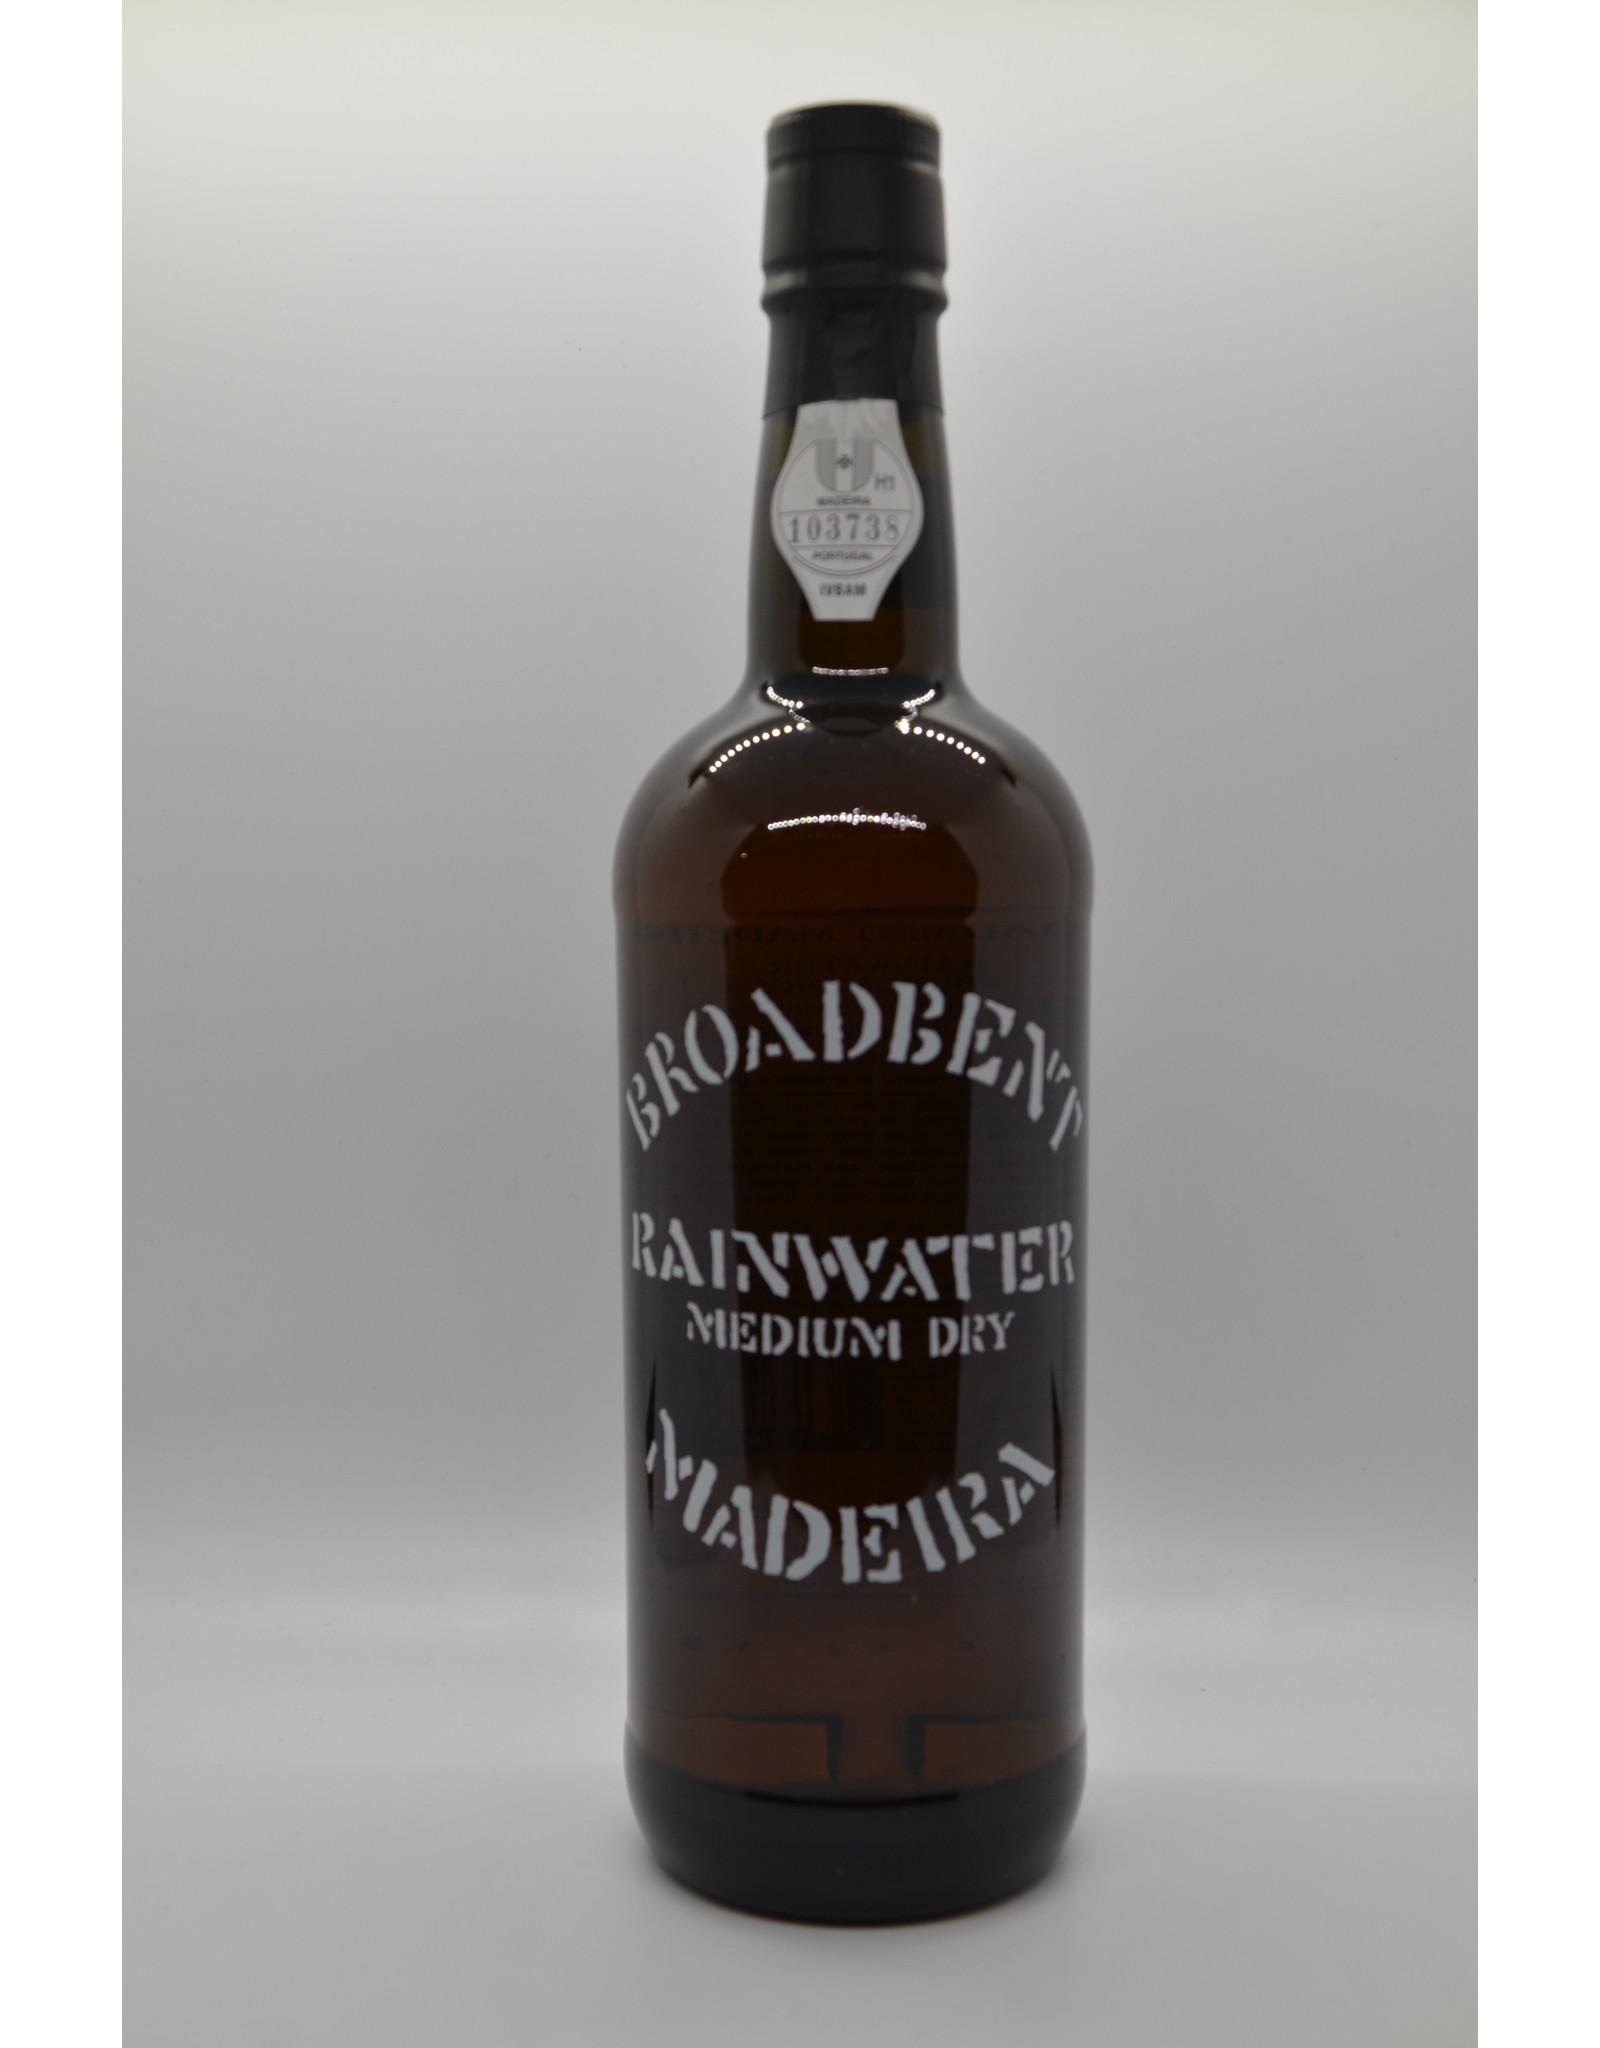 Portugal Broadbent Madeira Rainwater